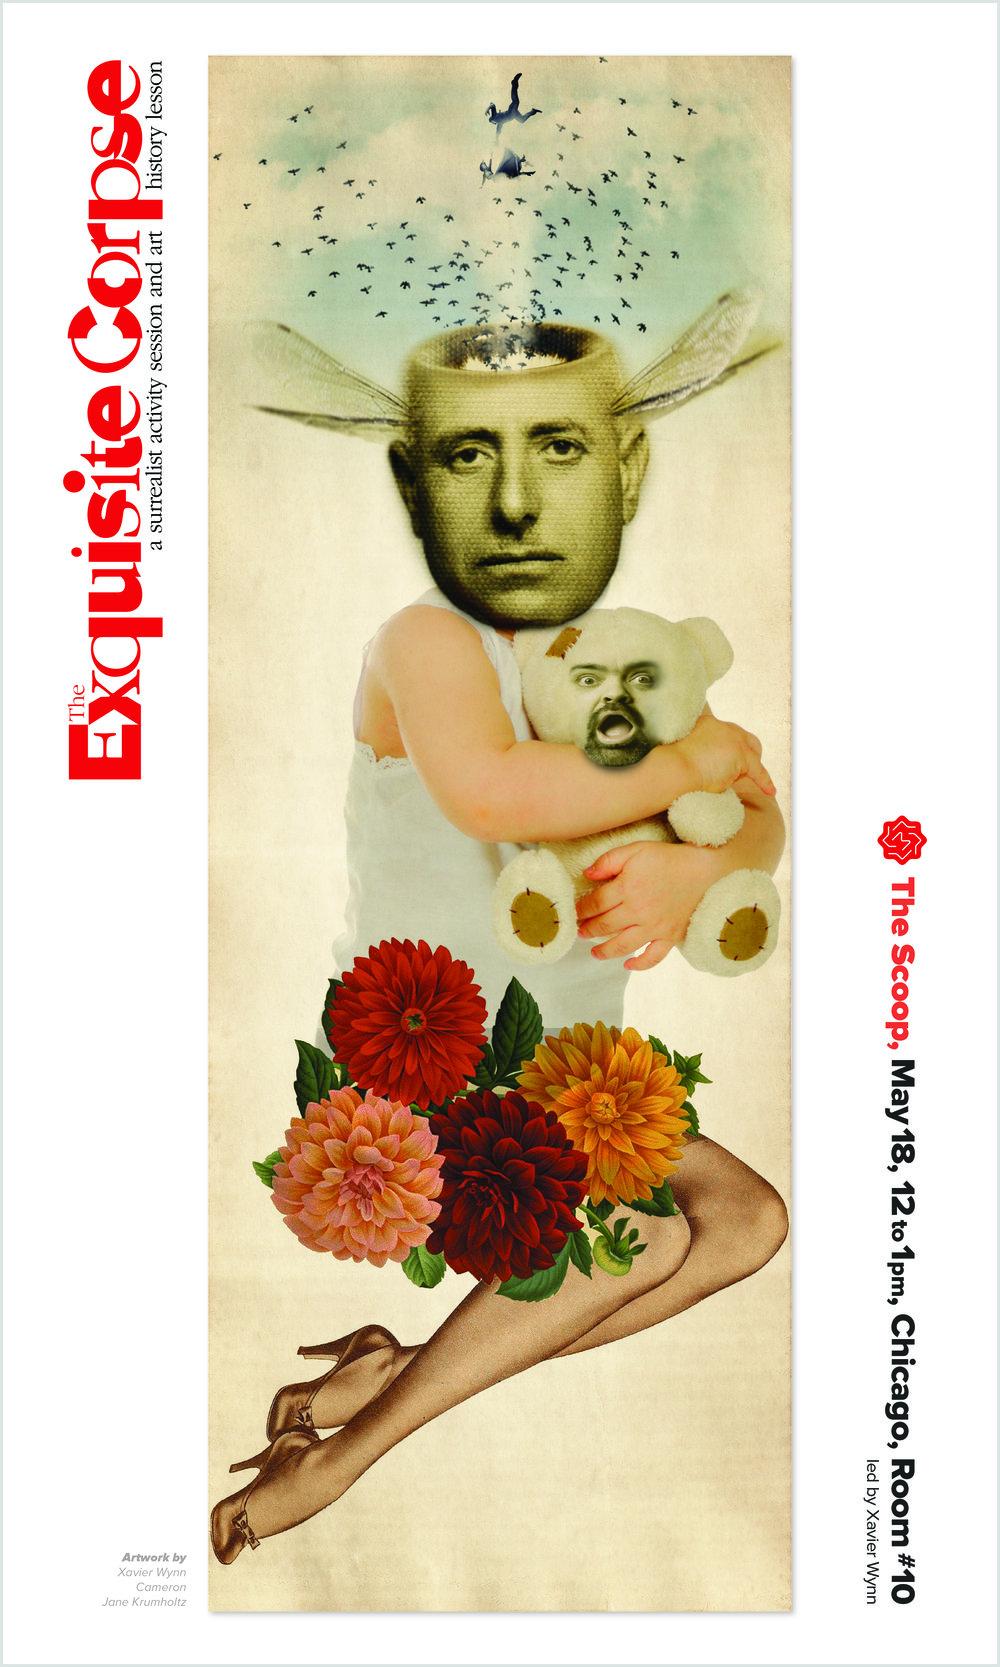 The Exquisite Corpse Poster   XW :Designer and Illustrator  Liam  Montgomery:   Illustrator  Jane  Krumholz:   Illustrator